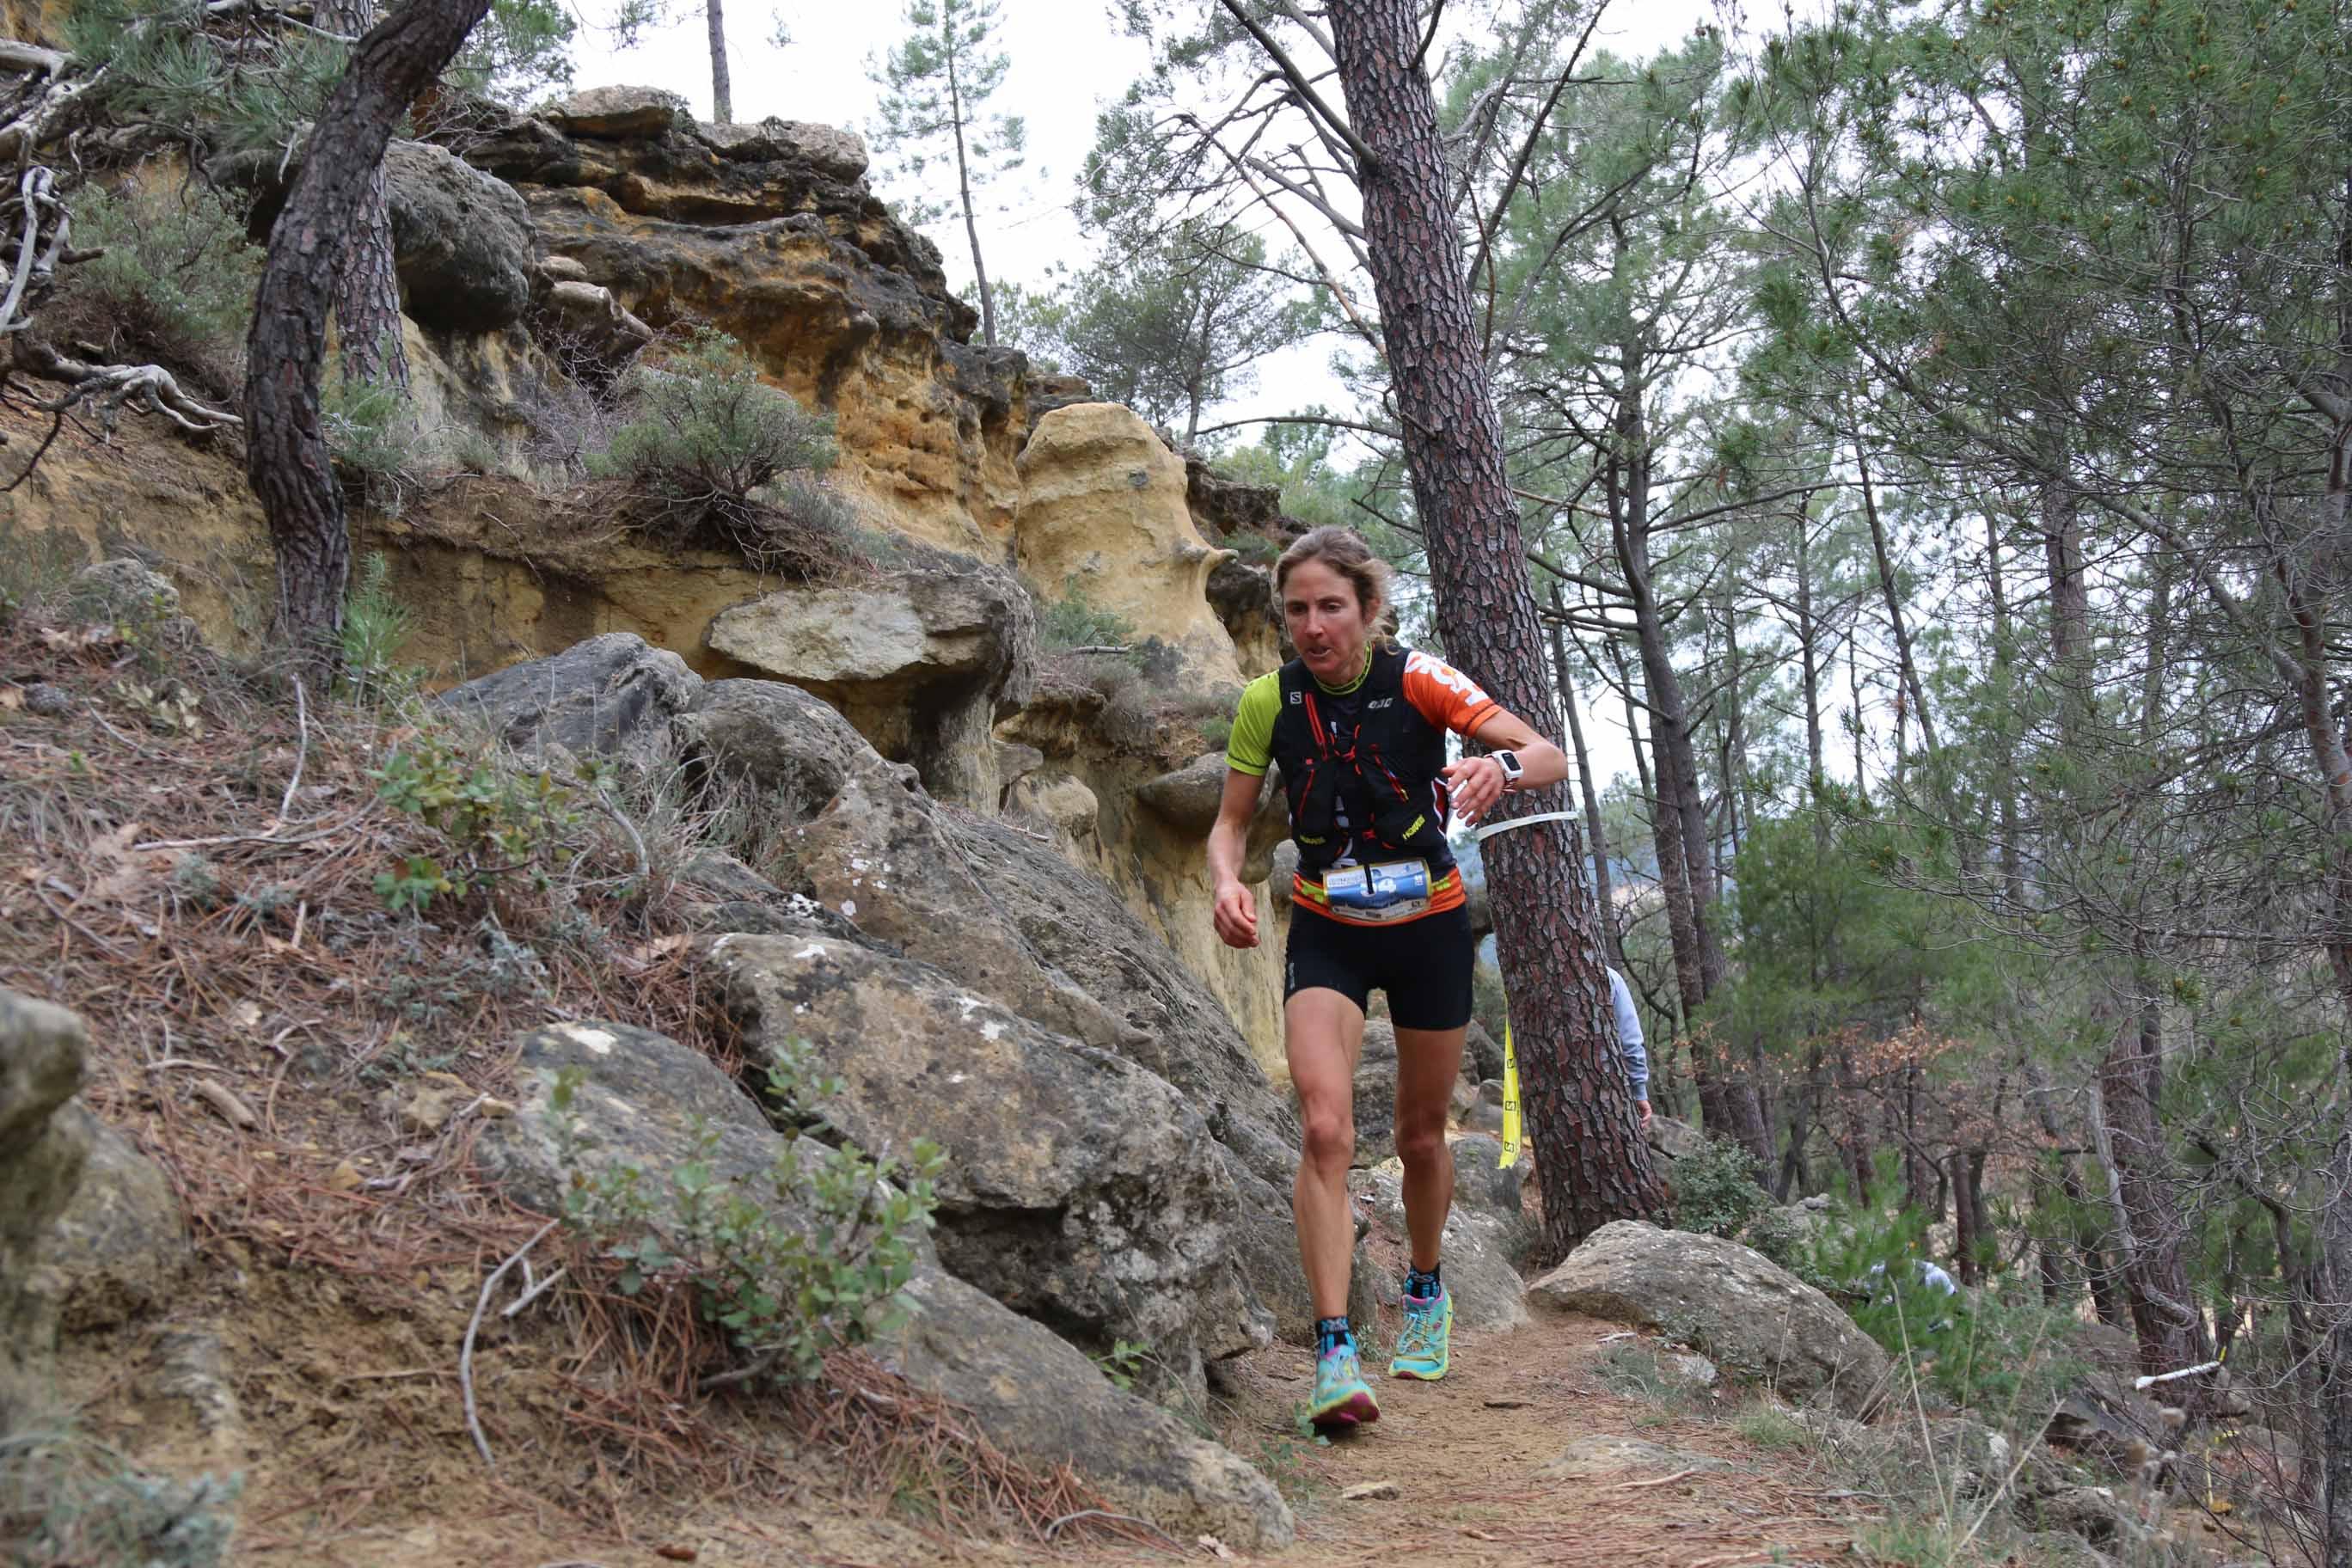 1 Caroline Chaverot vainqueur 46 km photo Robert Goin